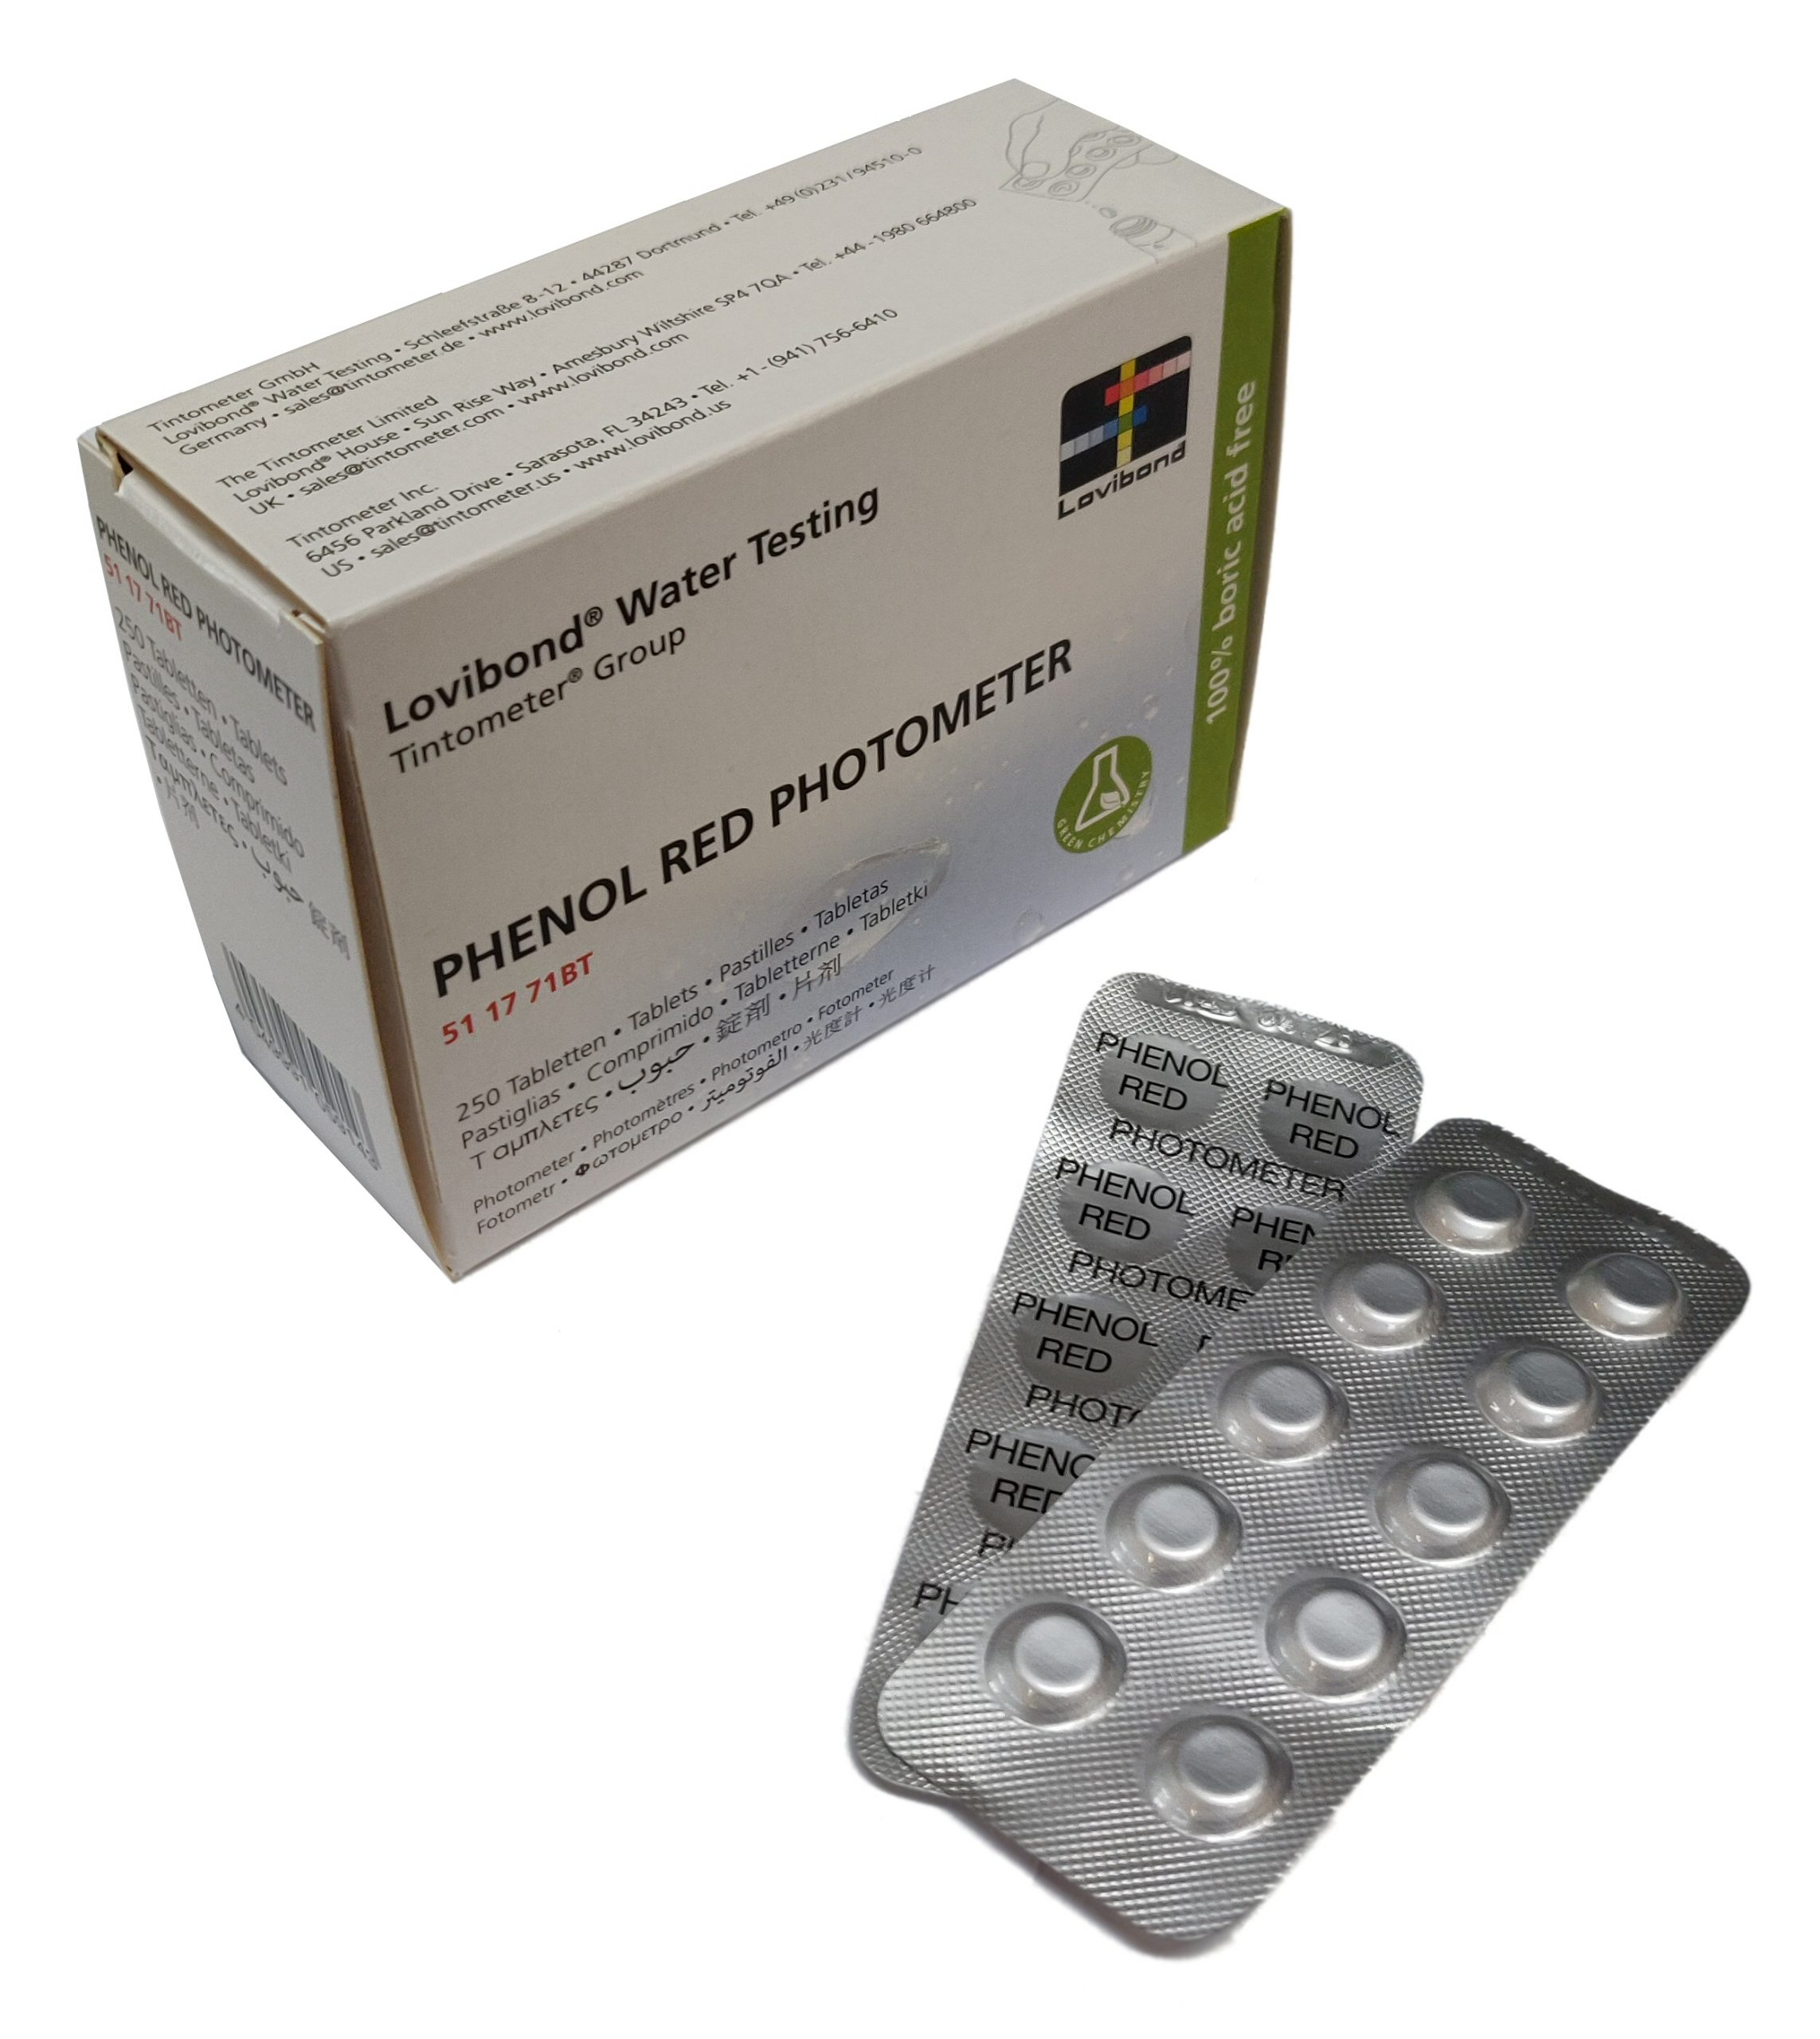 pHenol Red, pH (Photometer)